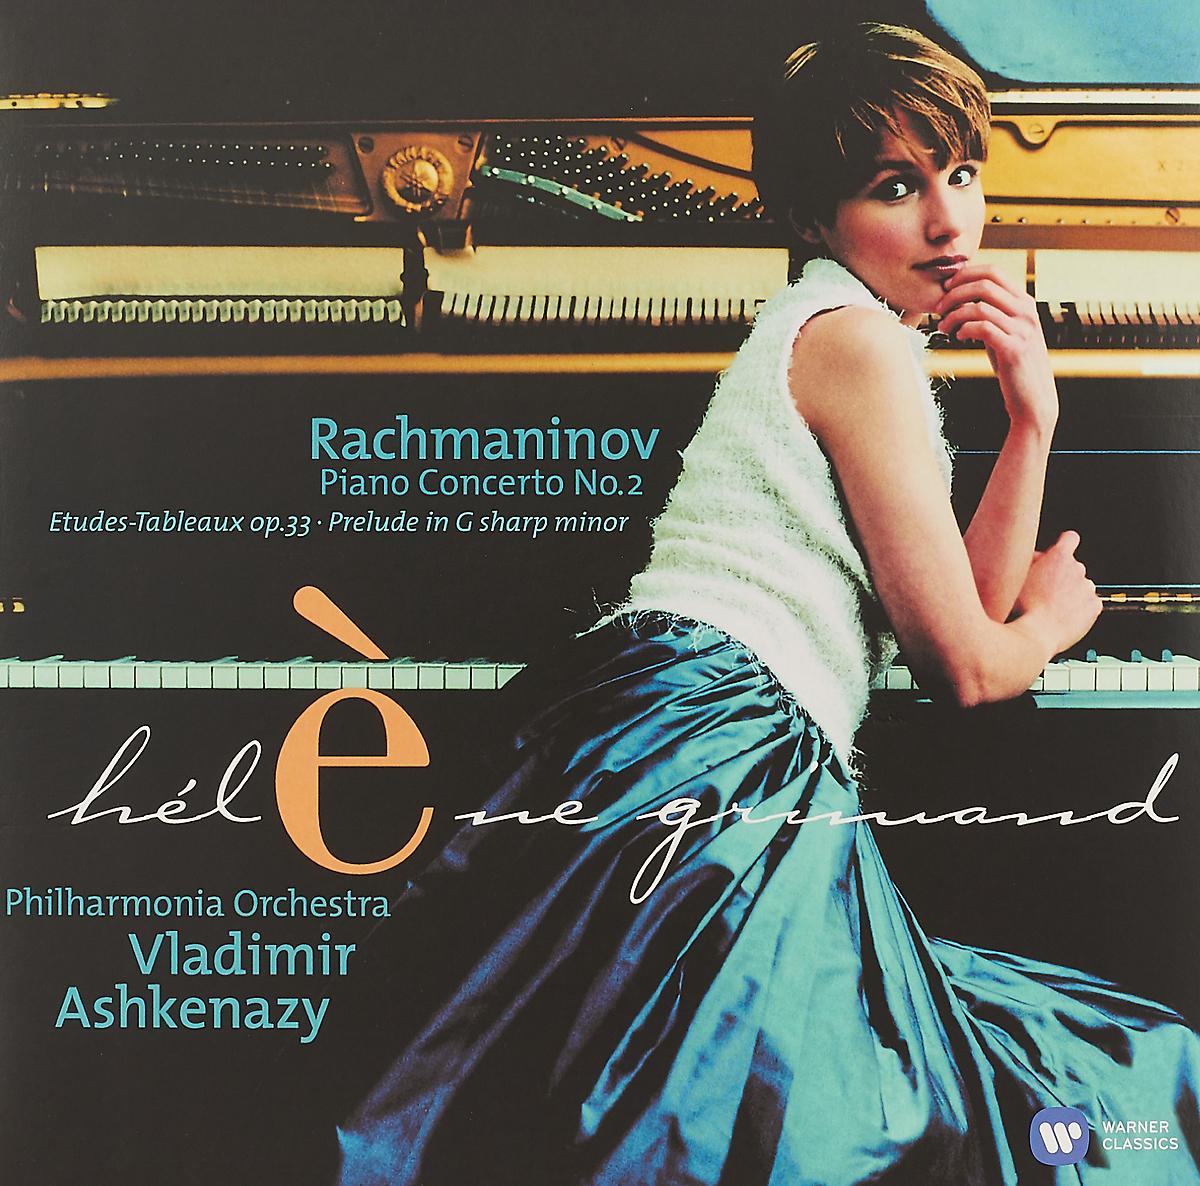 Элен Гримо Helene Grimaud. Rachmaninov: Piano Concerto No. 2 (LP)